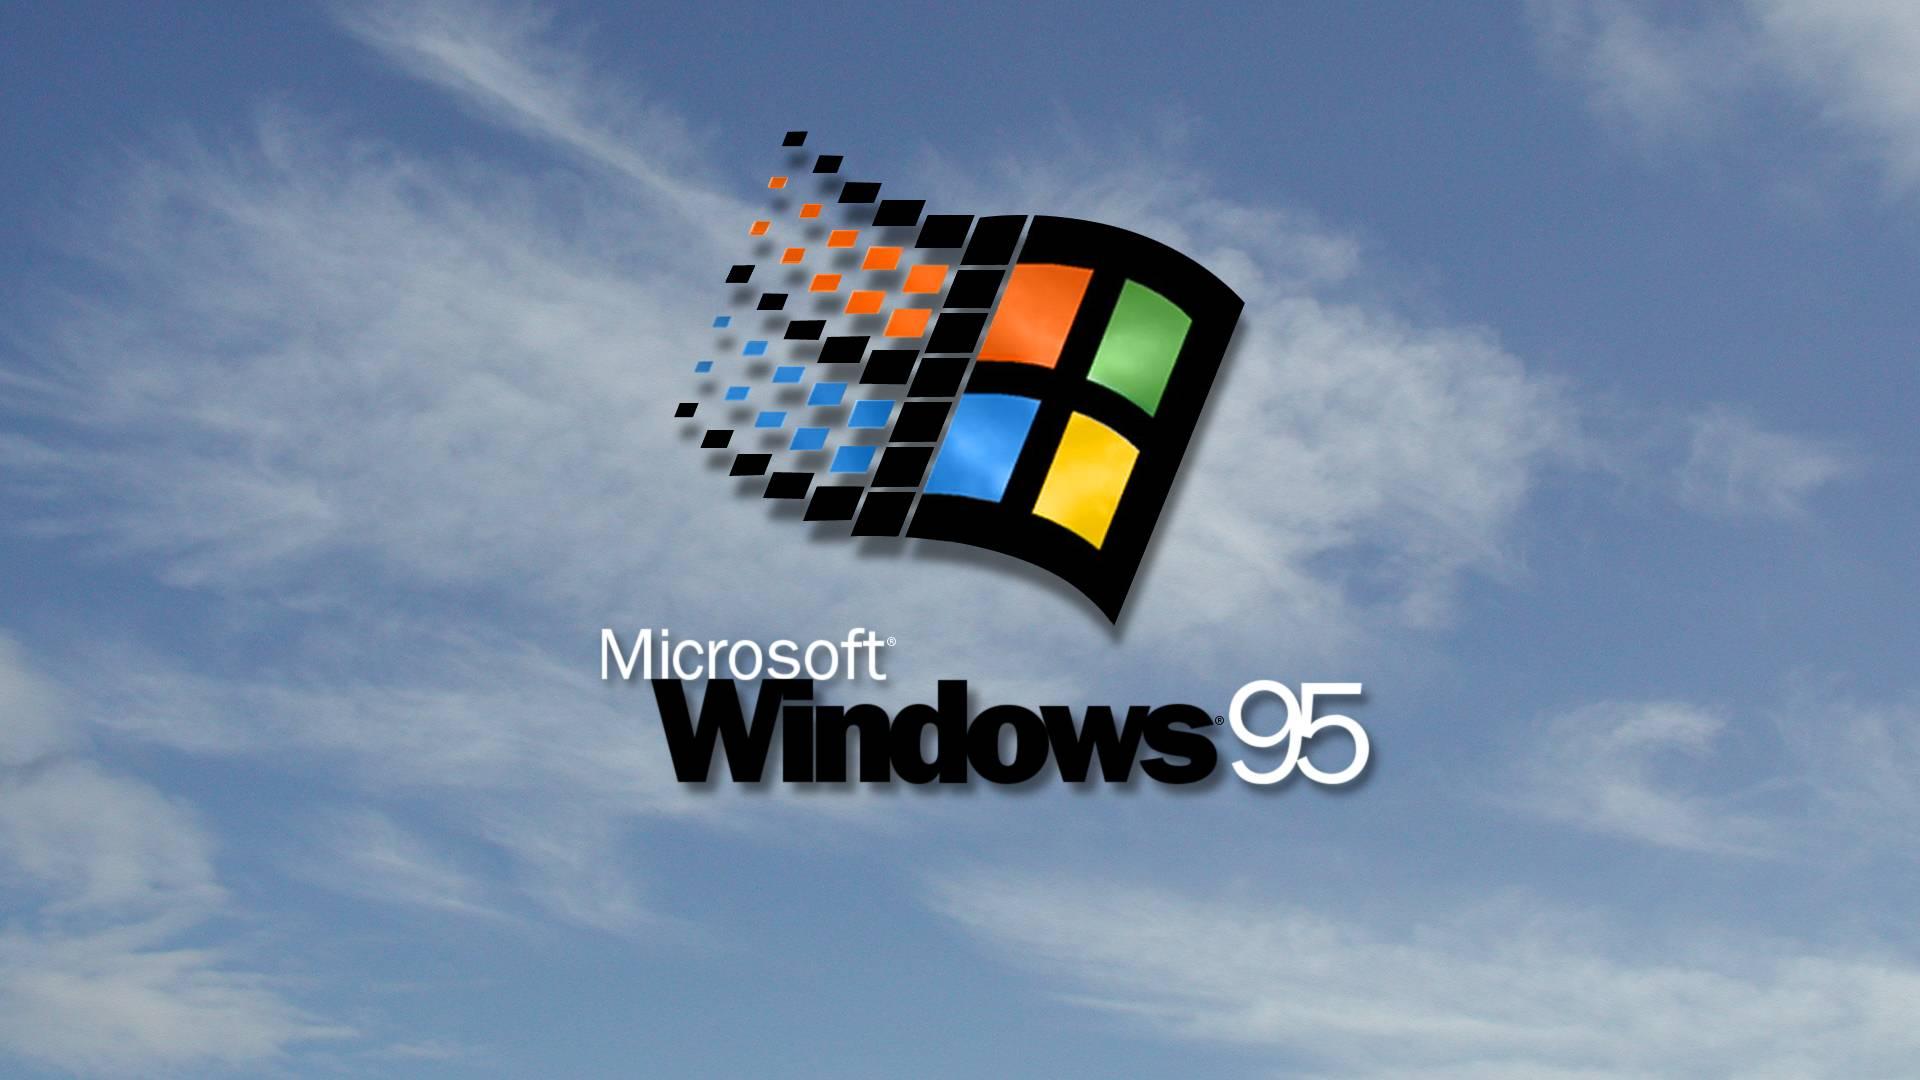 2589478 mb classic windows 95 source keys wallpaper wallpapers 1920x1080